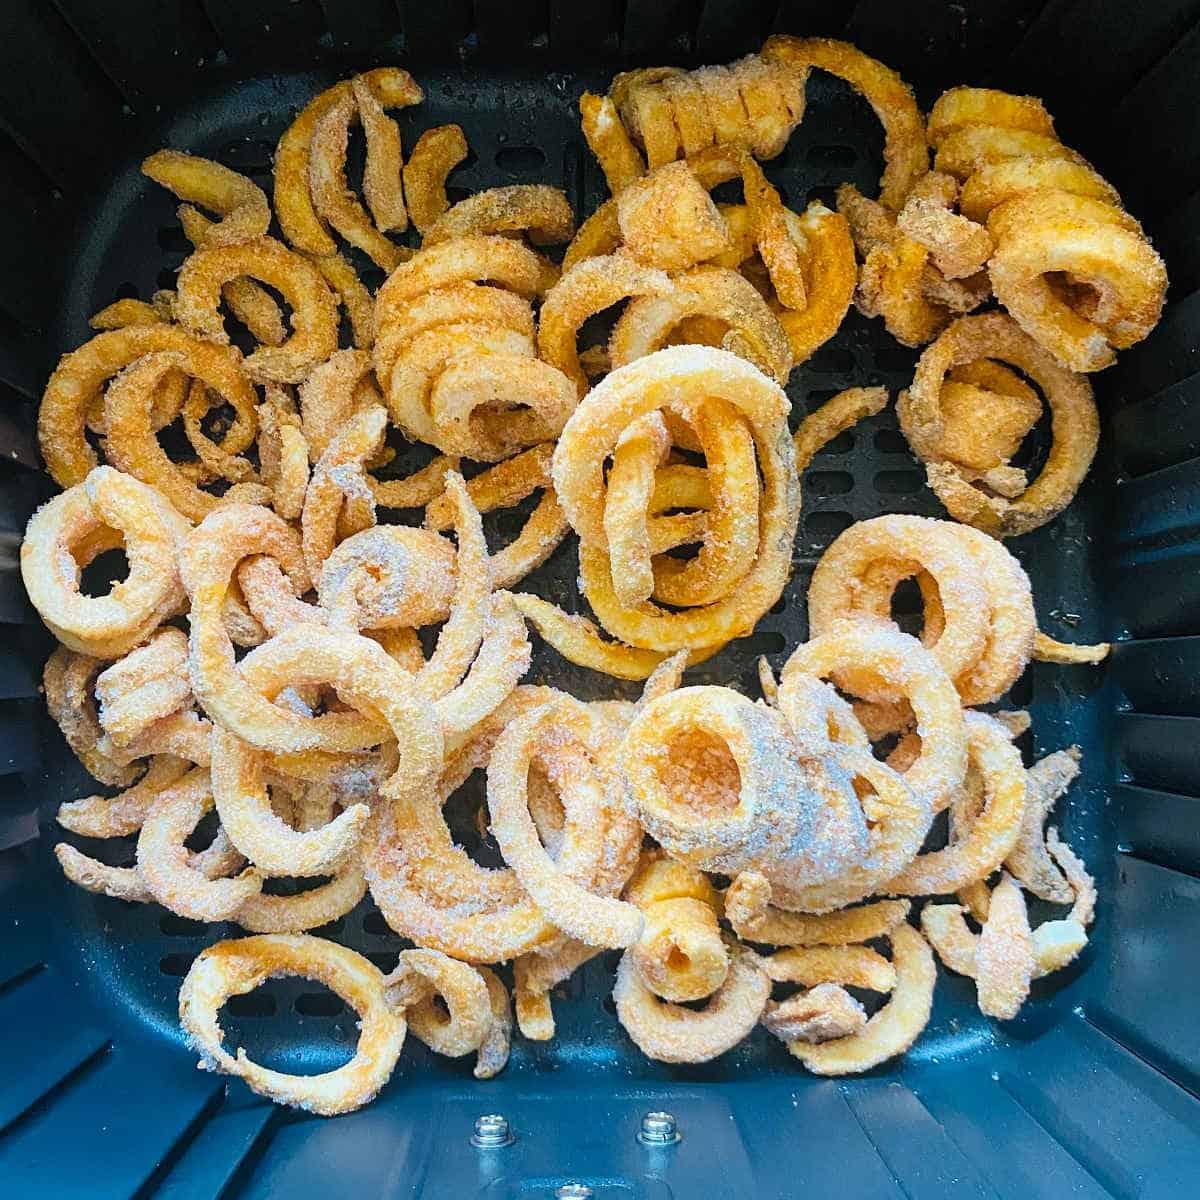 frozen curly fries in air fryer basket